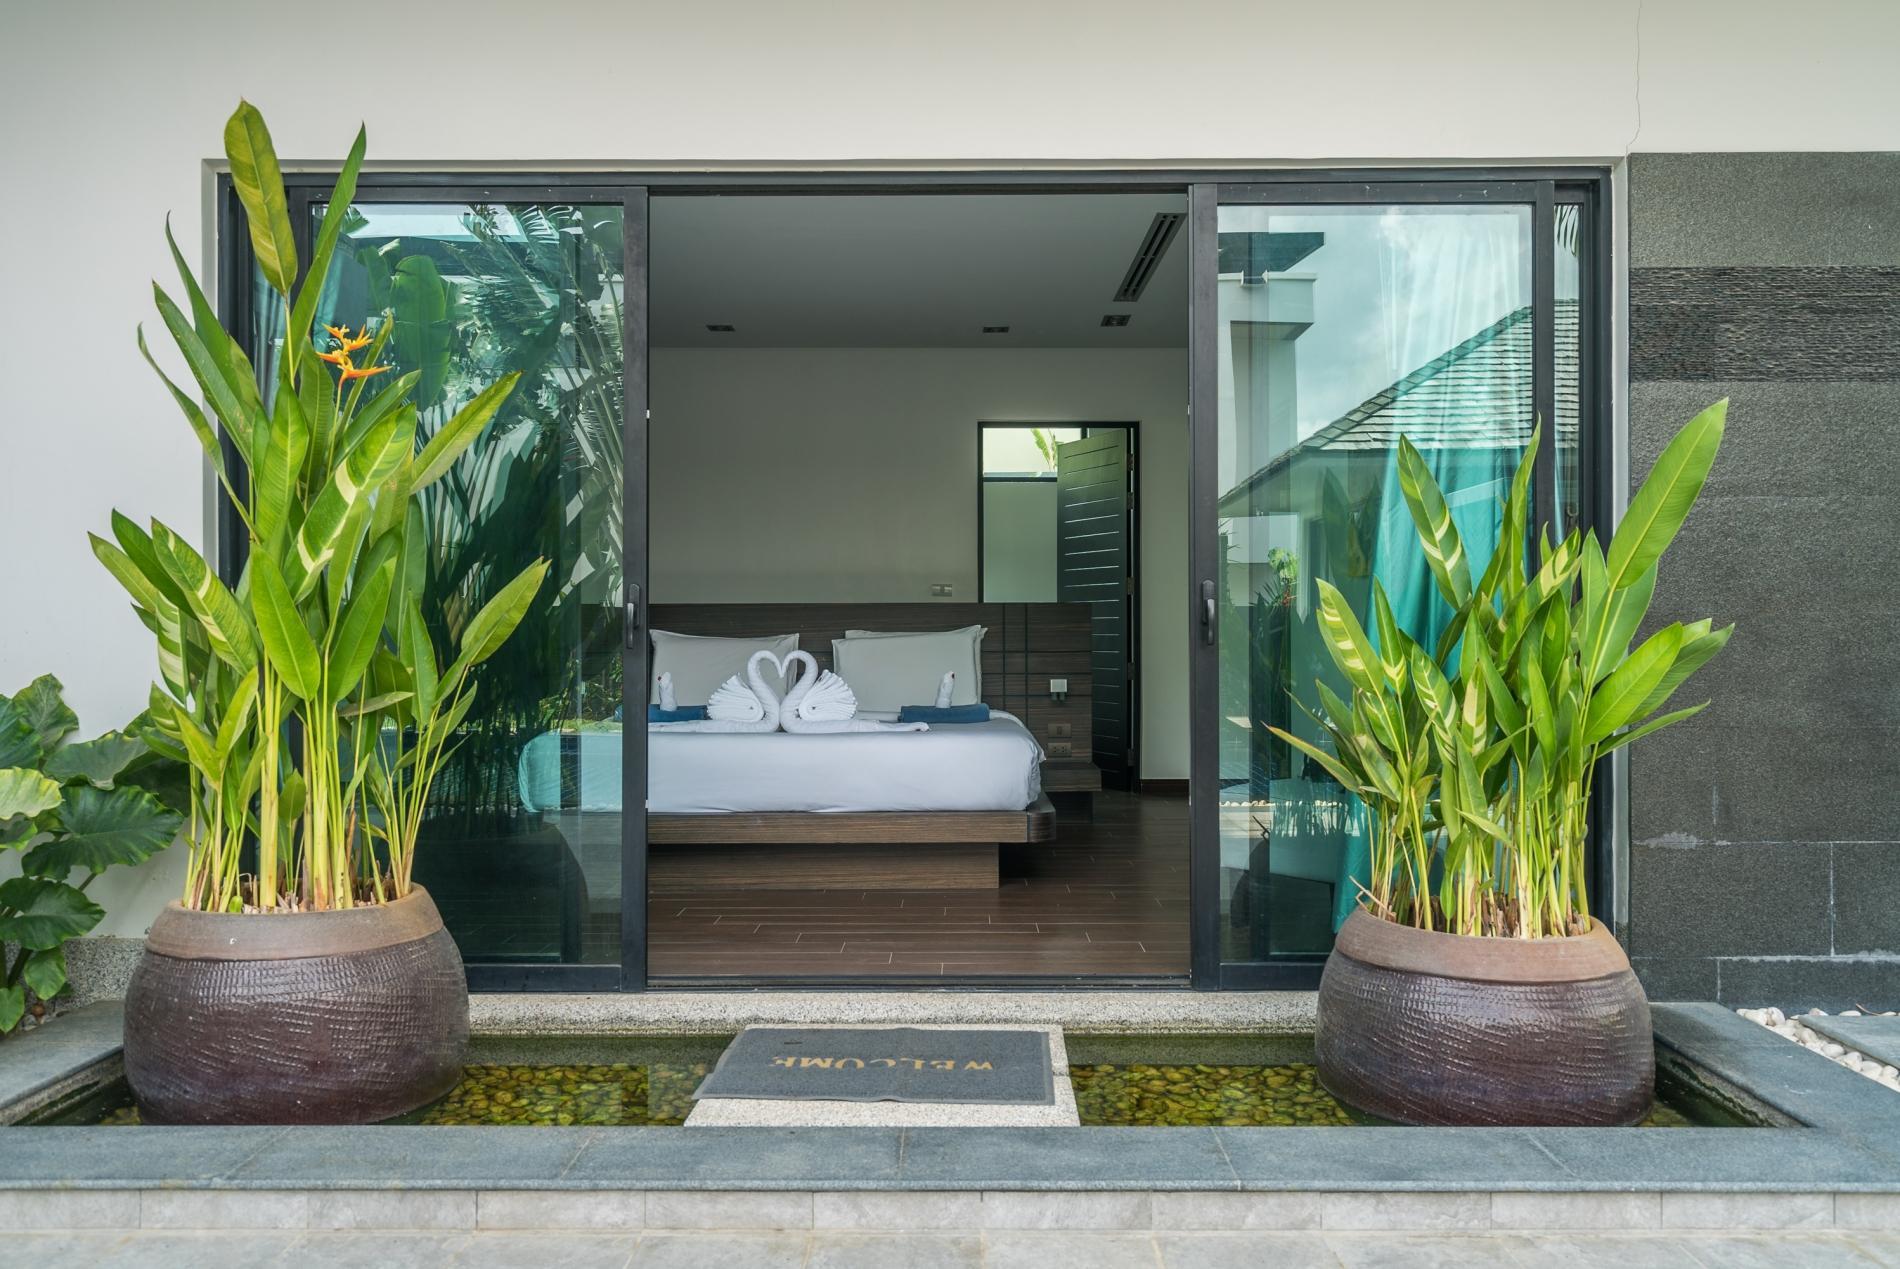 Apartment Diamond 272 - Modern 4 br private pool and garden villa photo 26956873